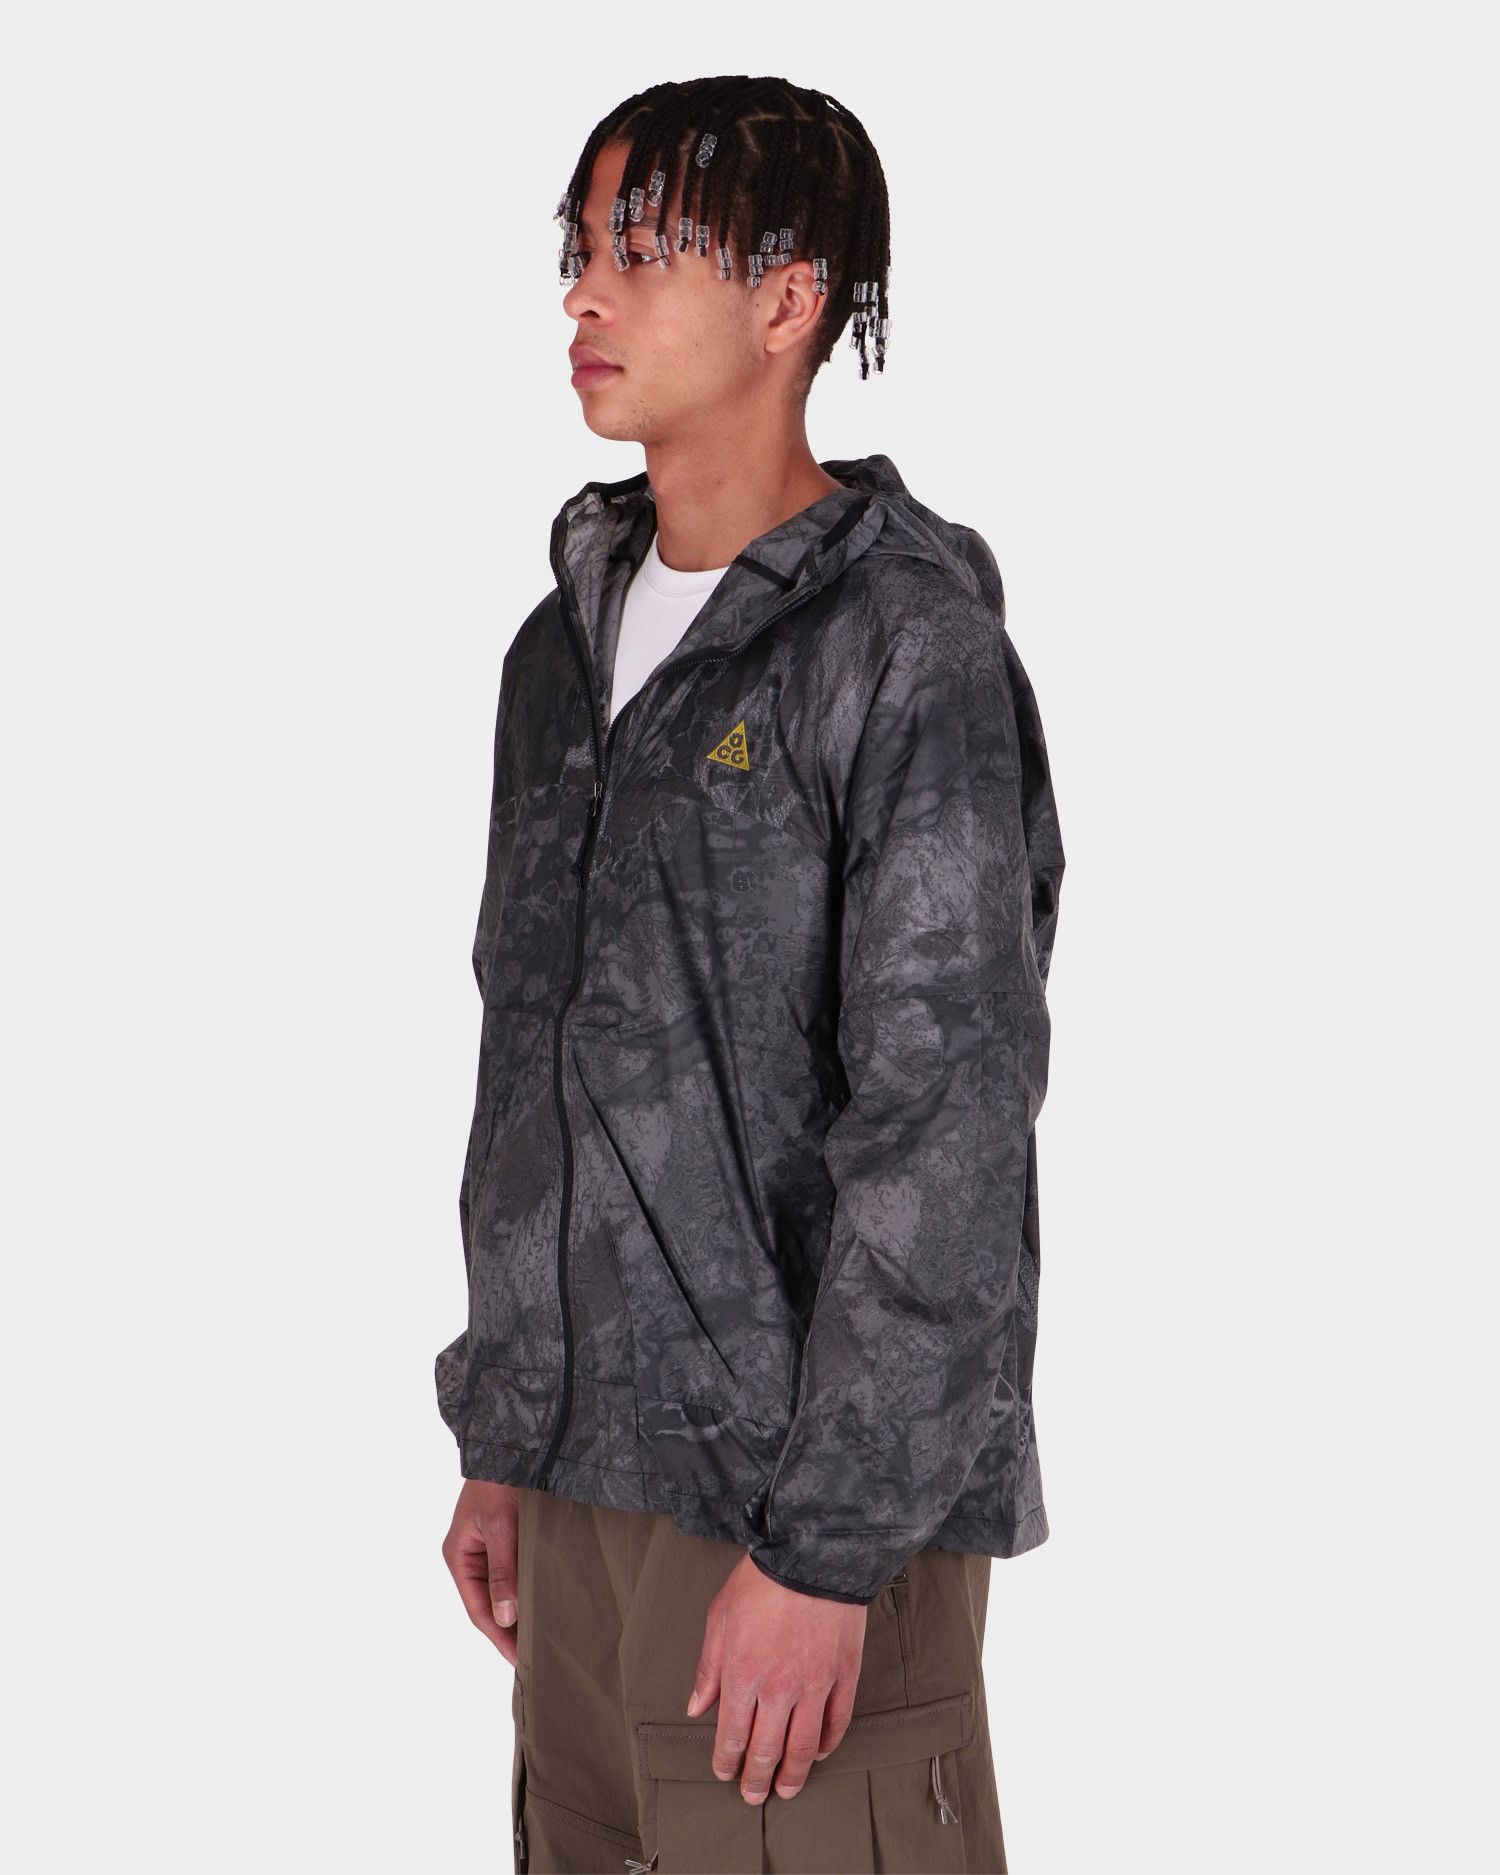 Nike M NRG ACG Jacket Black/Peat Moss